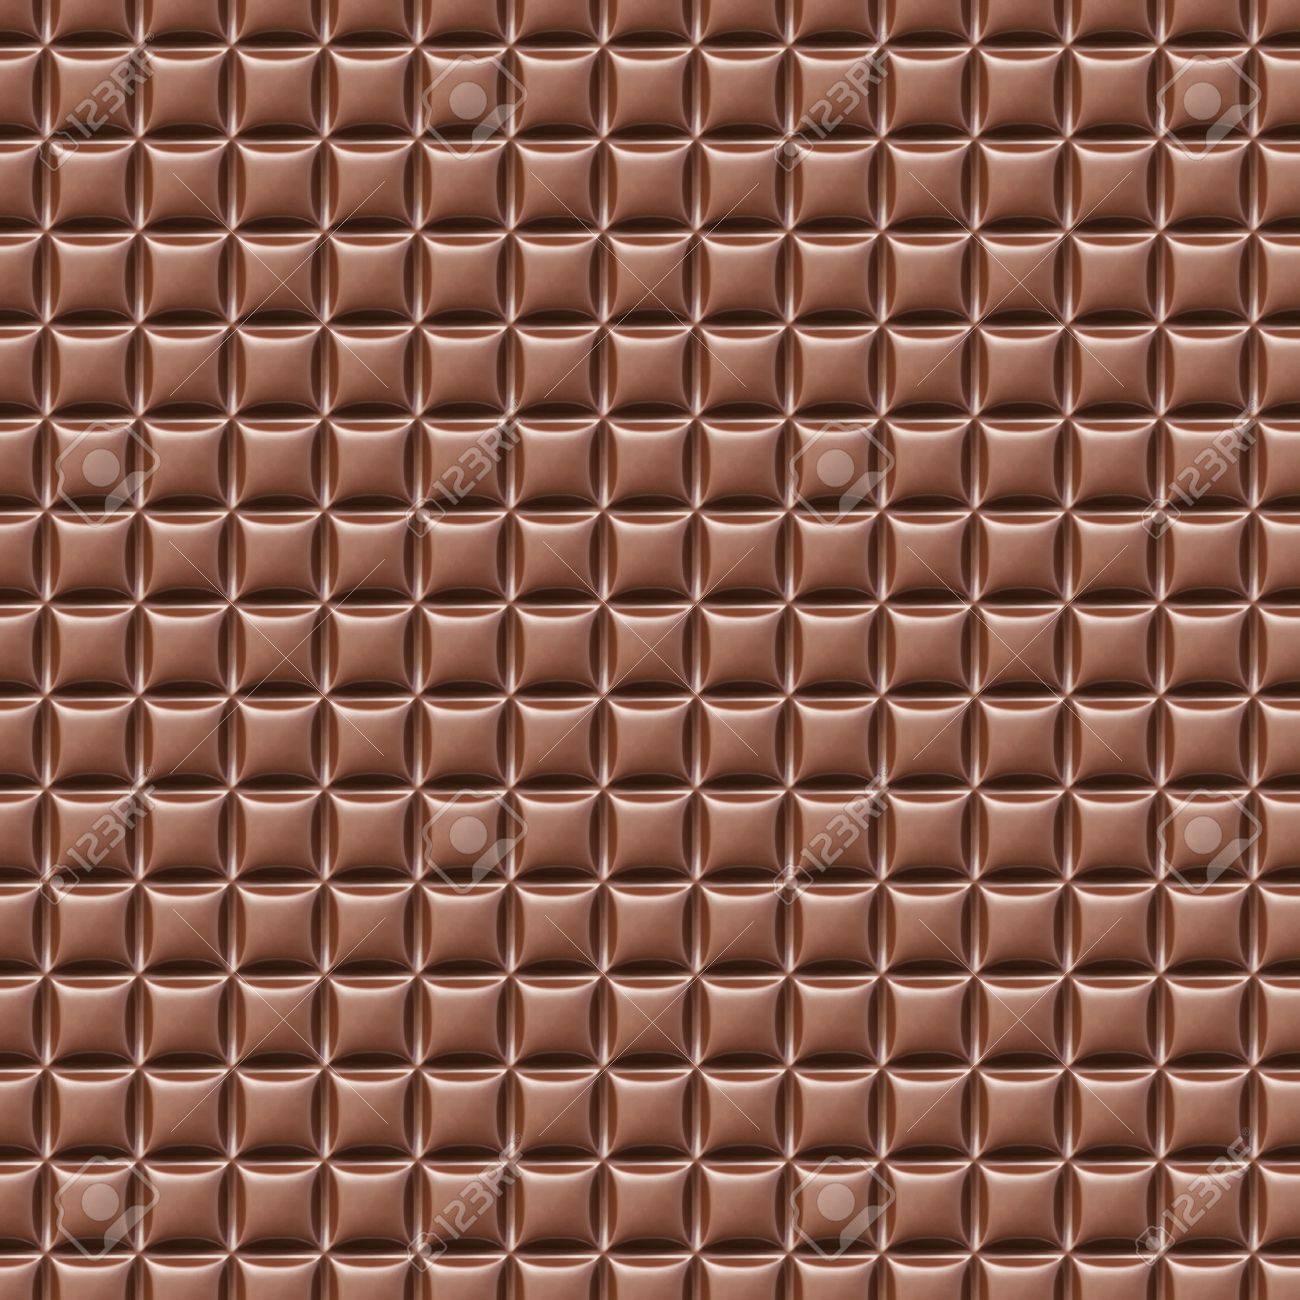 Chocolate background - 13500385